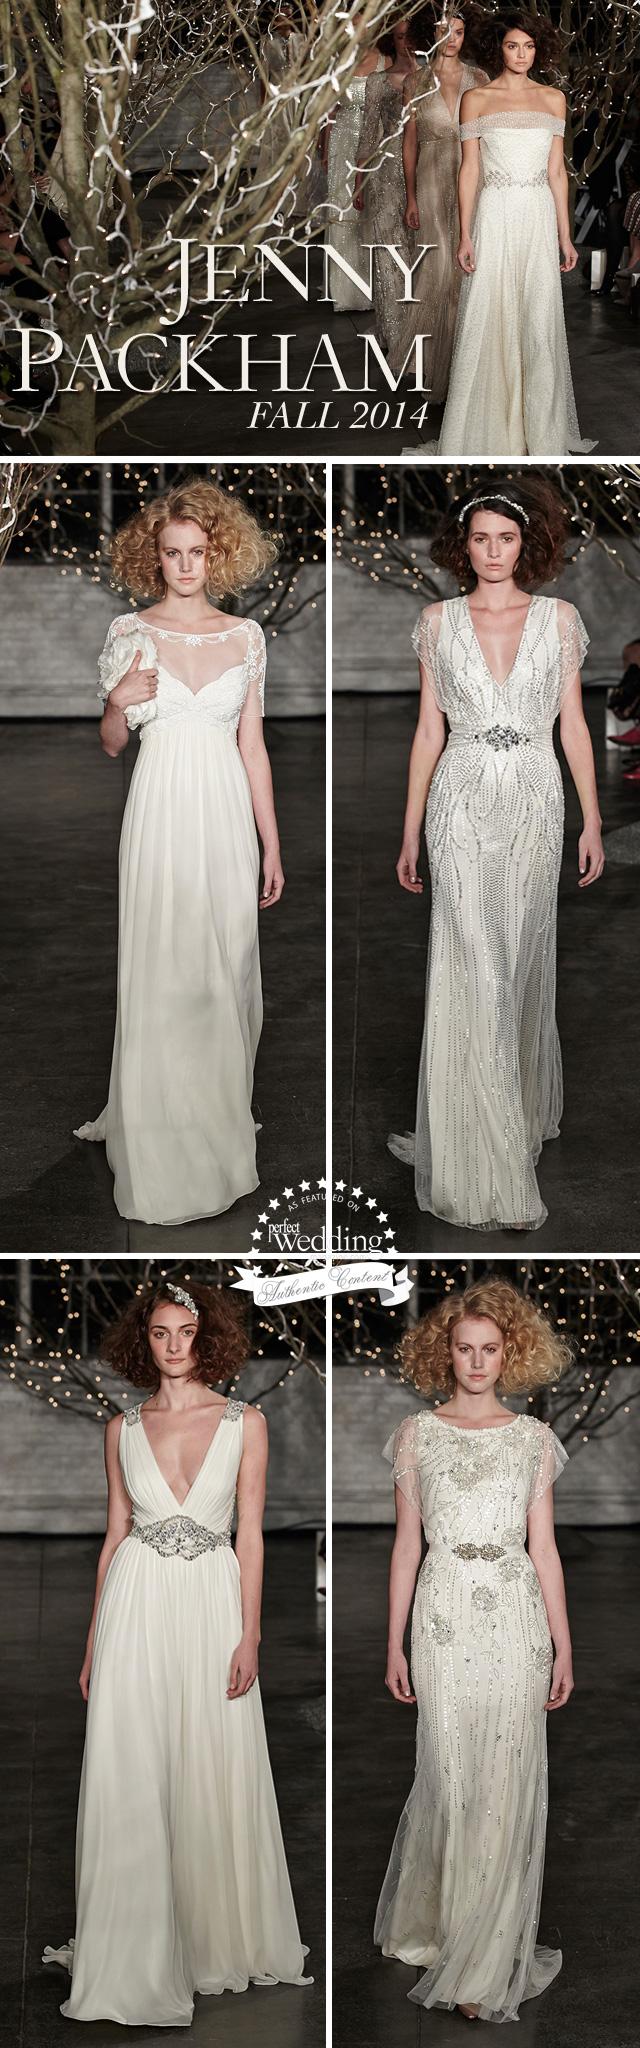 Jenny Packham, 2014 Bridal Collection, Perfect Wedding Magazine, Bridal Fashion, Bridal FashionWeek, New York